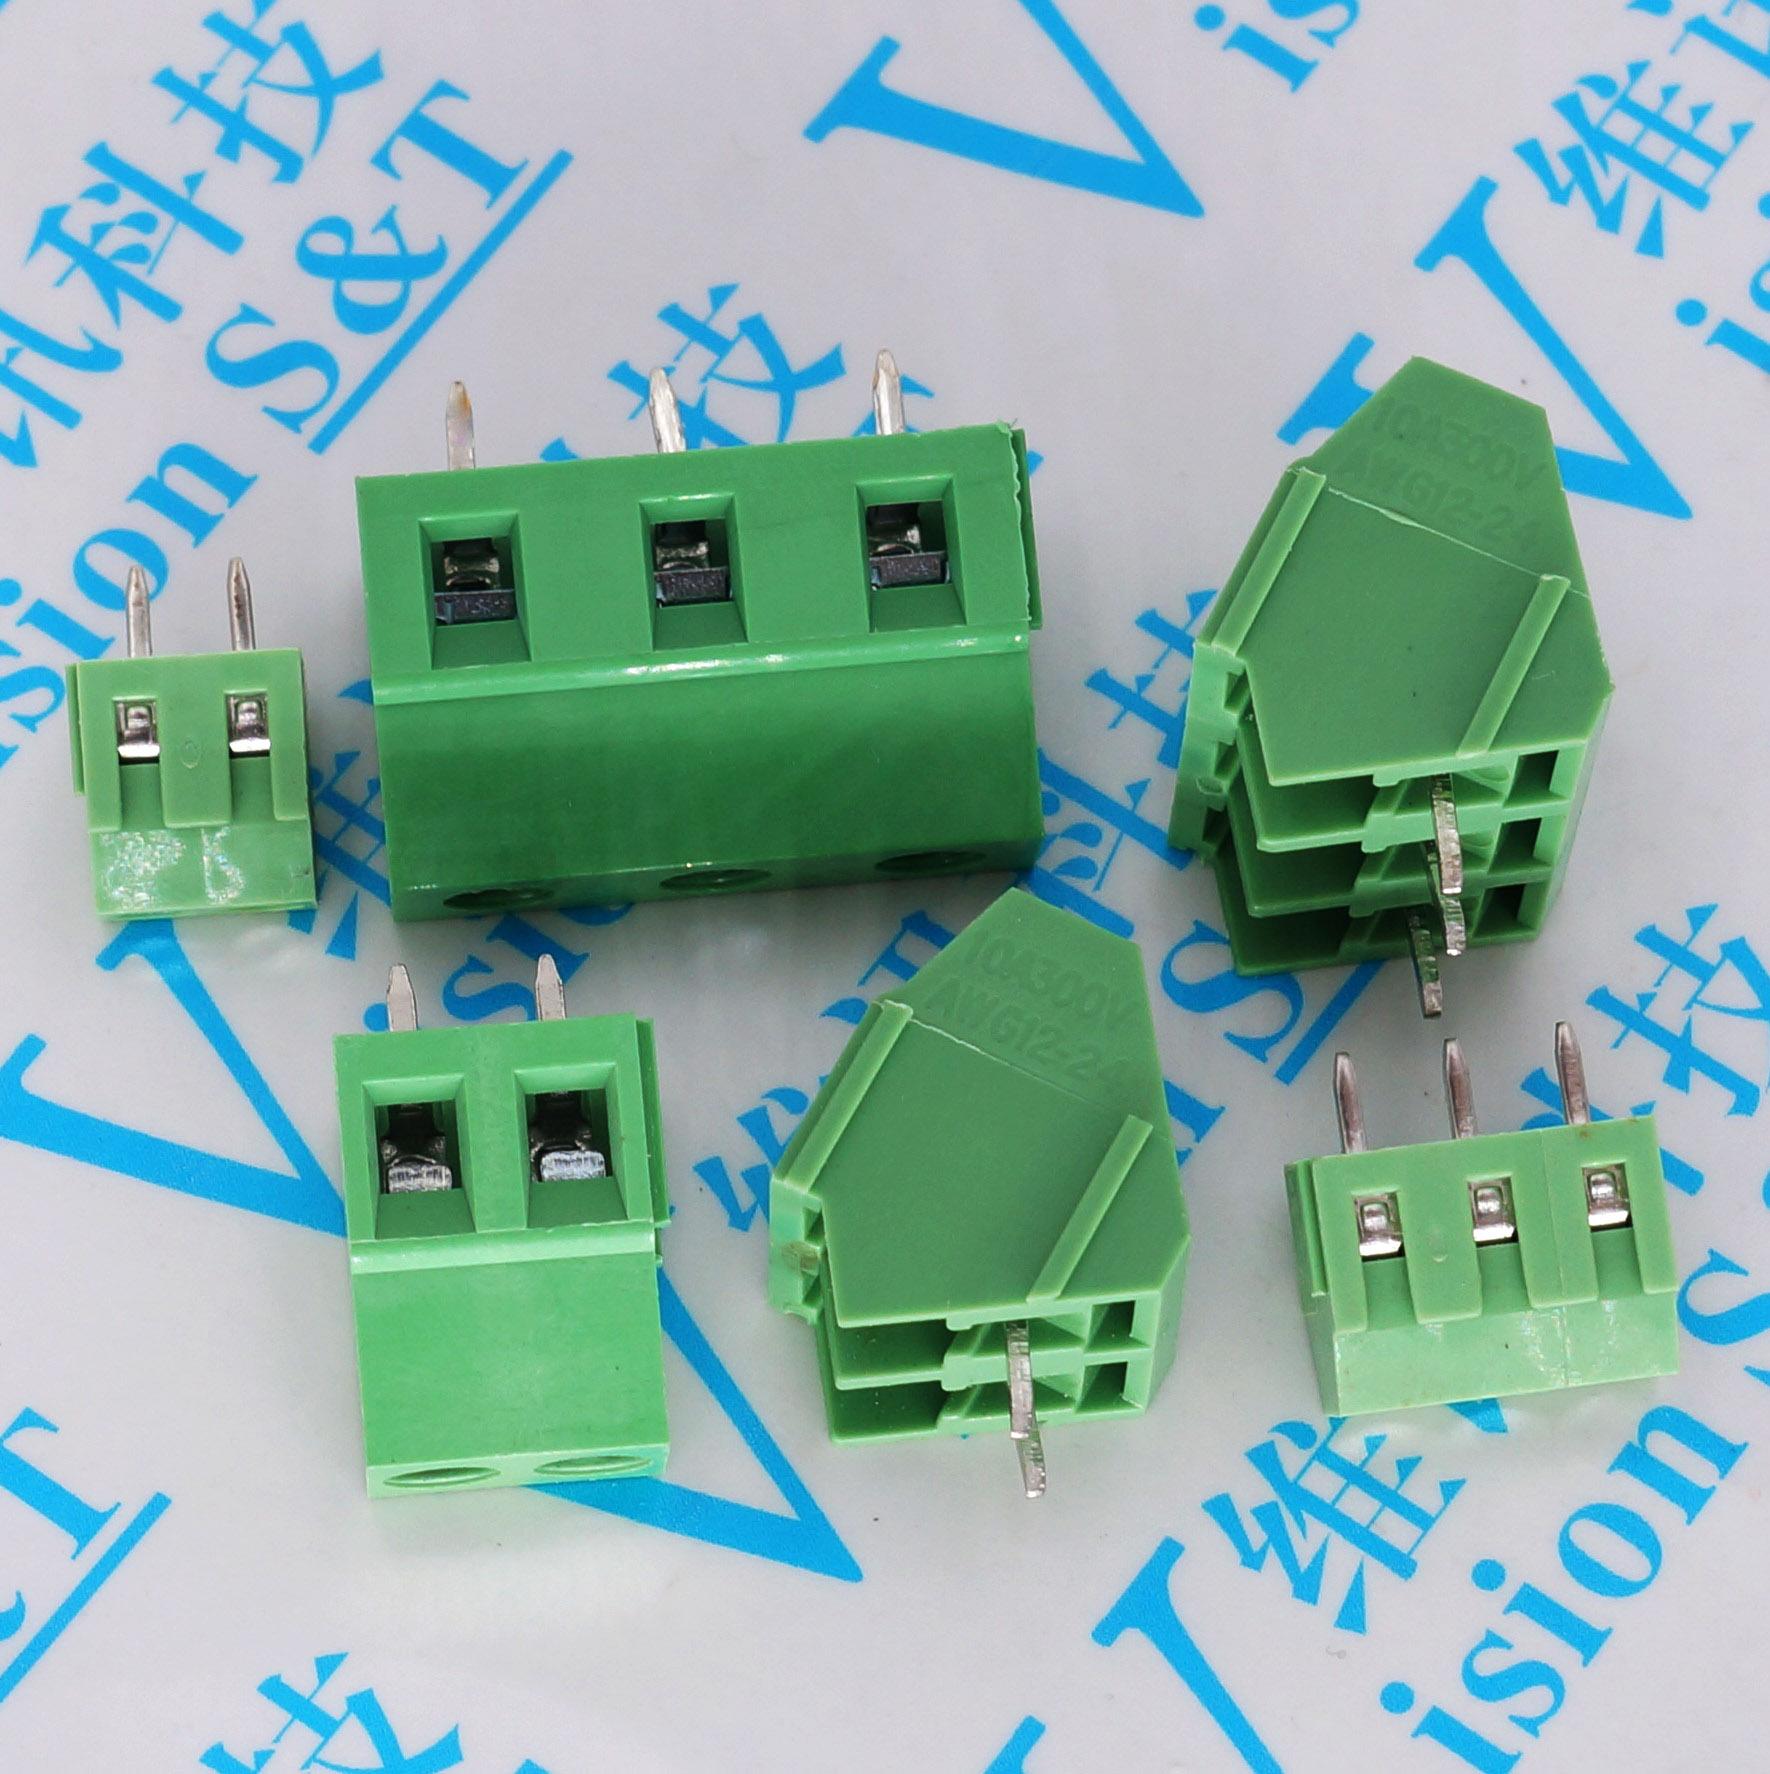 10pcs KF128 5.0 5.08 7.5 3.81mm PCB Screw Terminal Block Connector 2P 3P 4P 5P 6 Pin